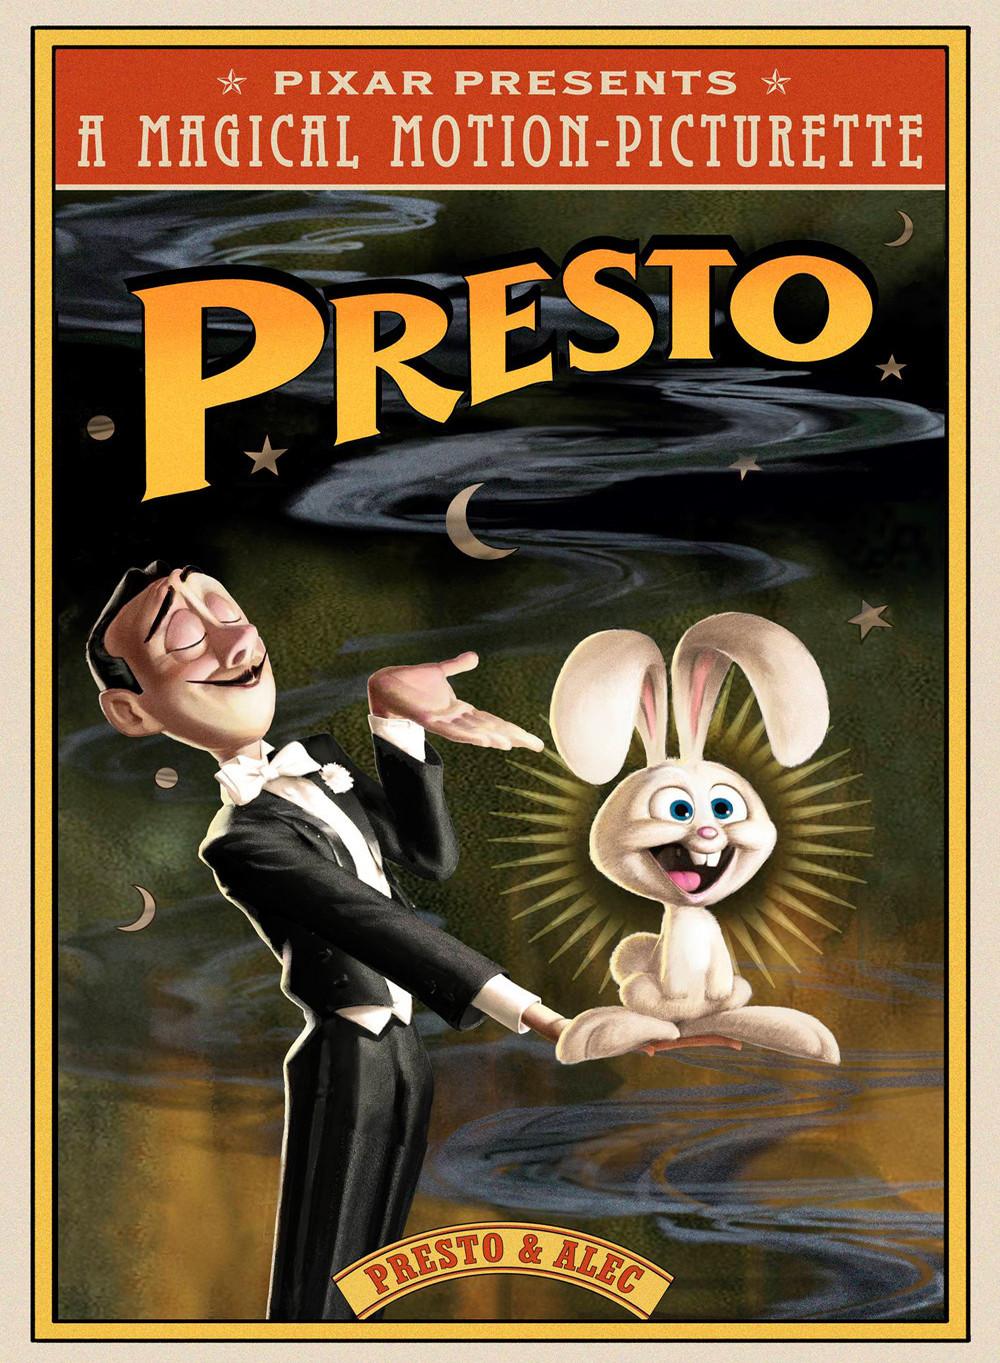 affiche du film Presto